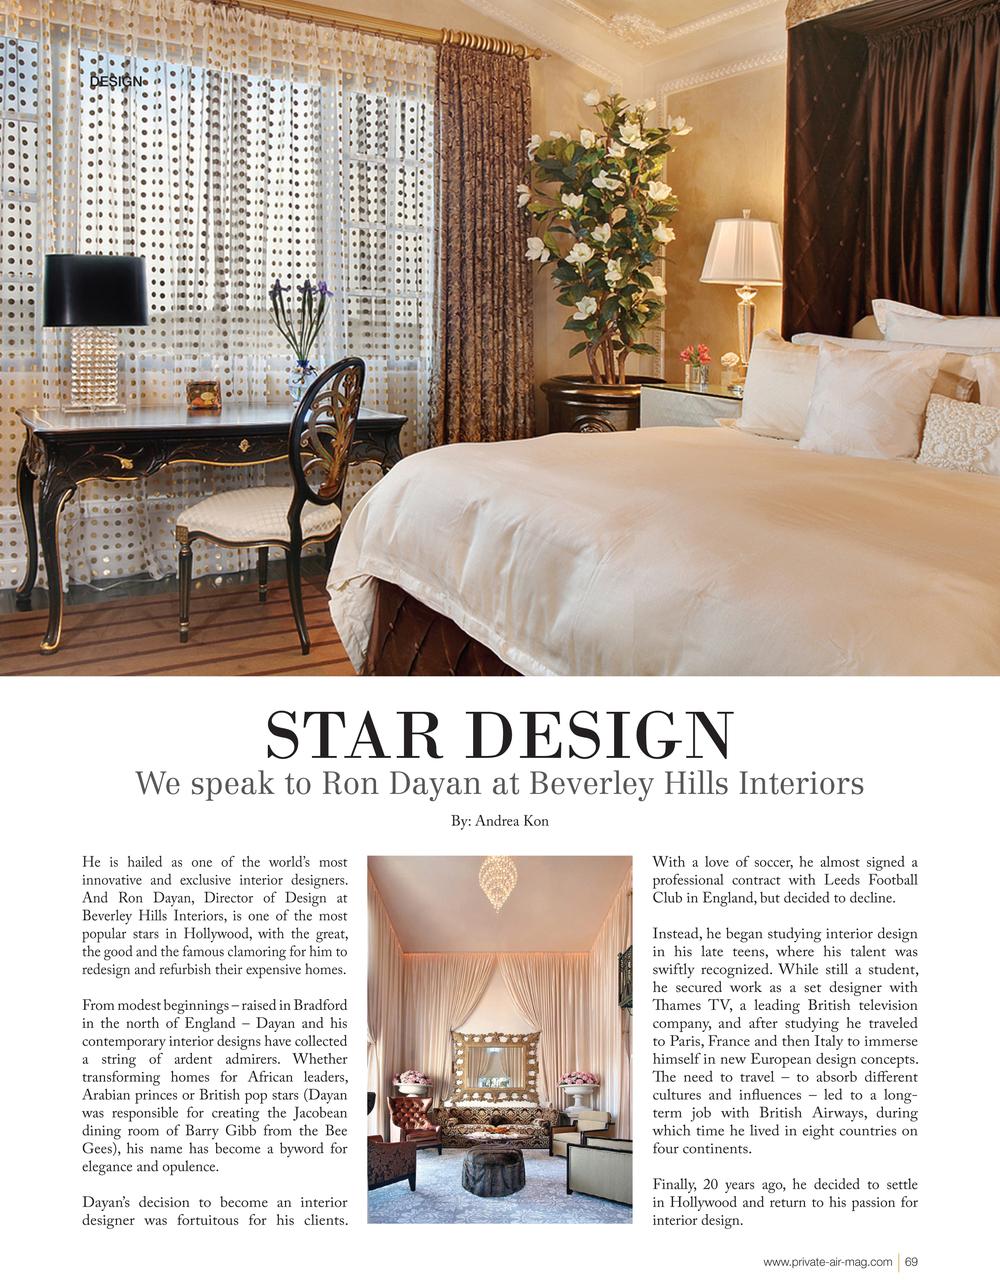 Star Design_1.jpg